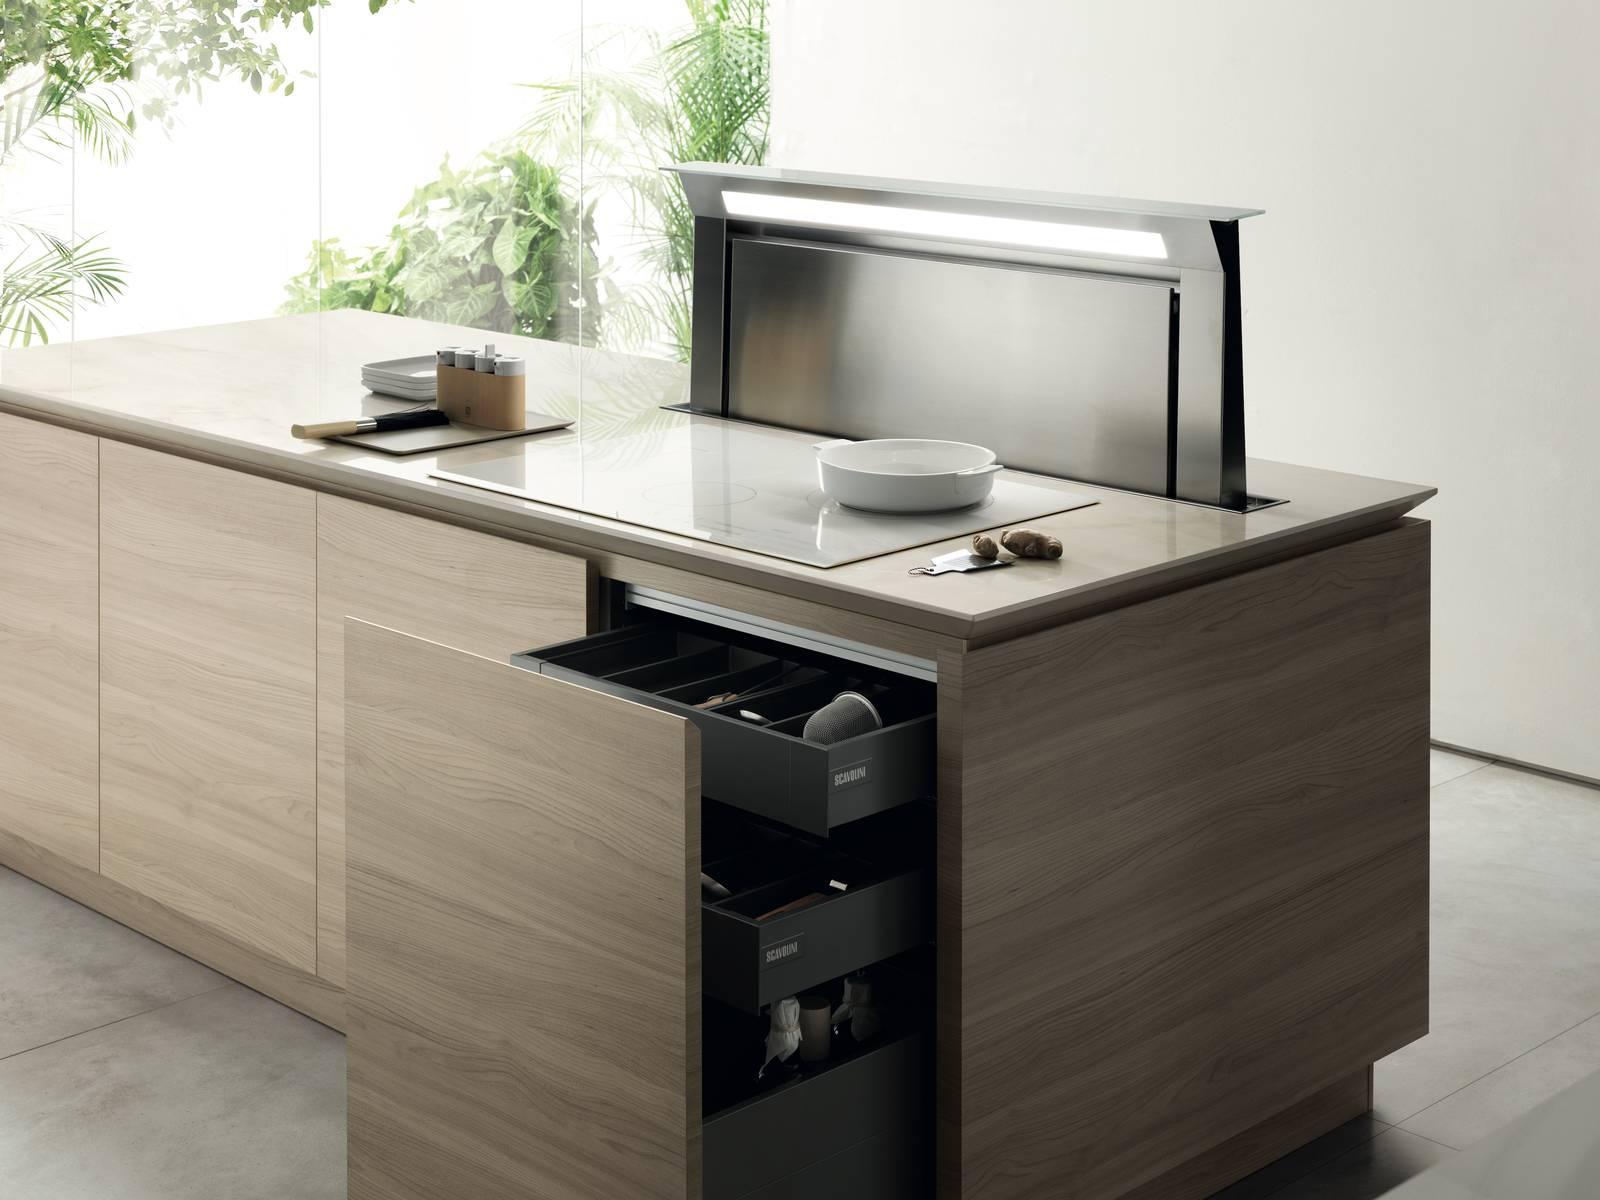 Cassetti, cassettoni, cestoni: la praticità in cucina - Cose ...